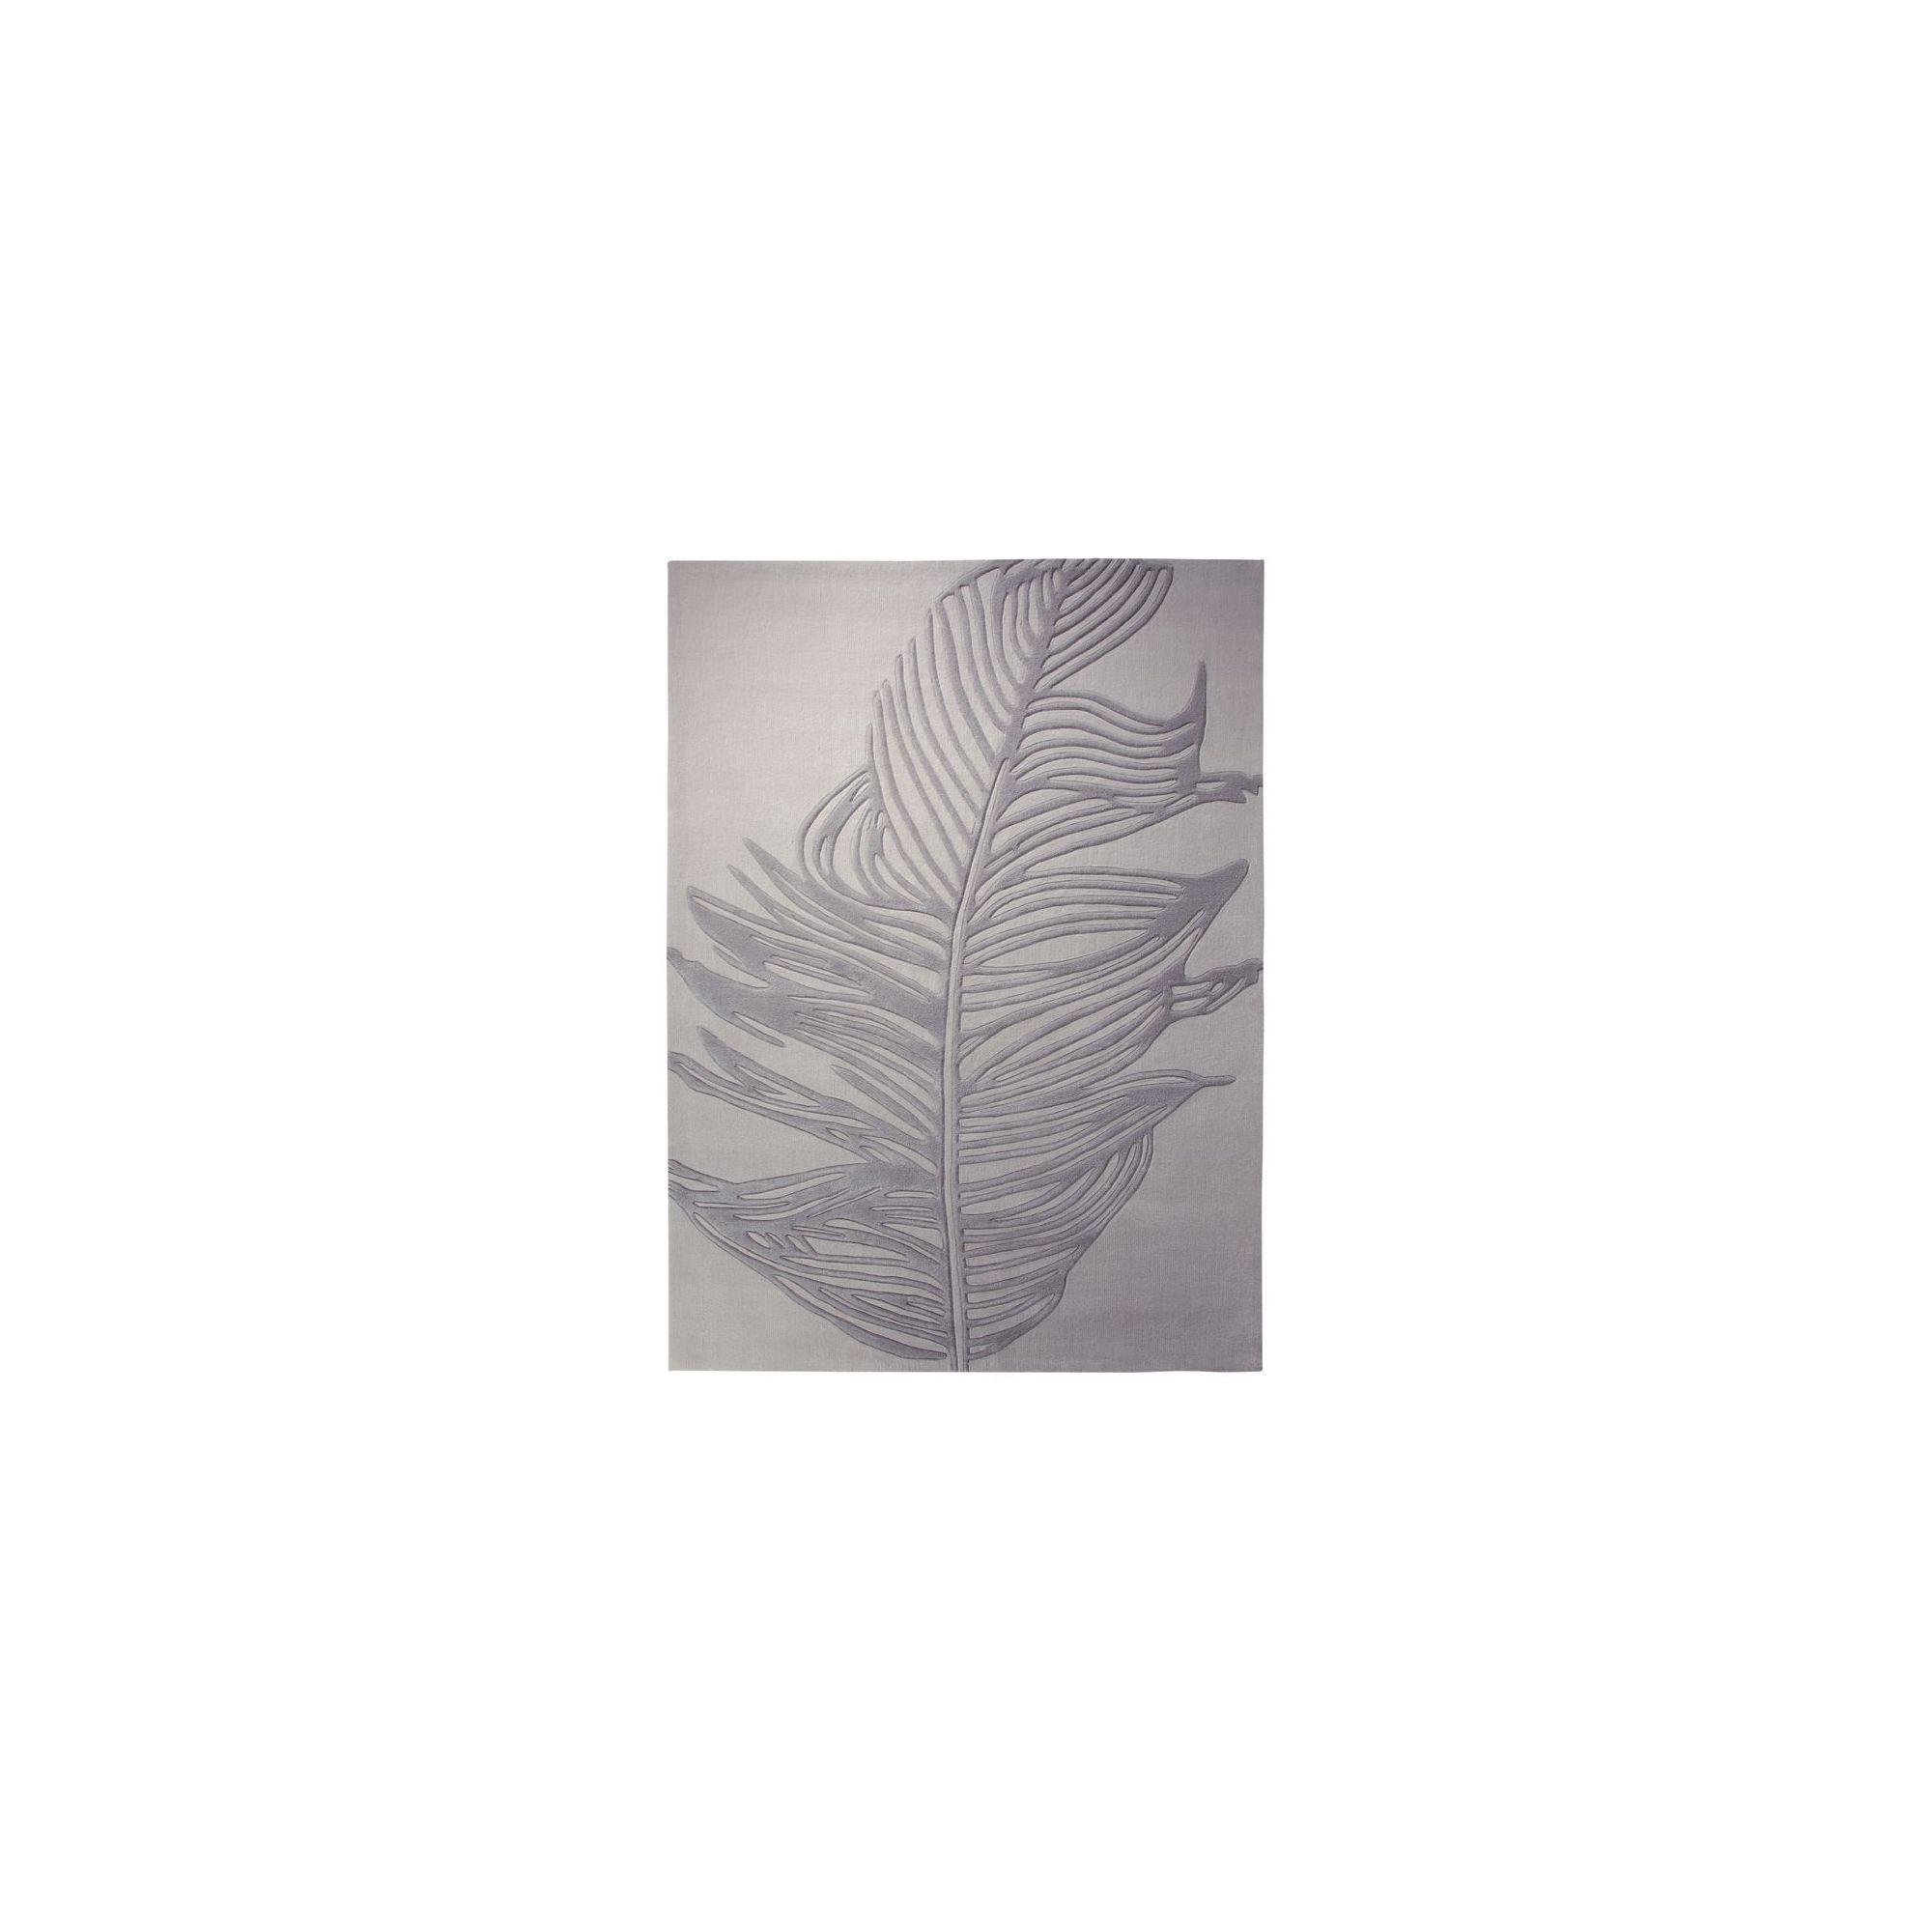 Esprit Feather Silver Novelty Rug - 140cm x 200cm